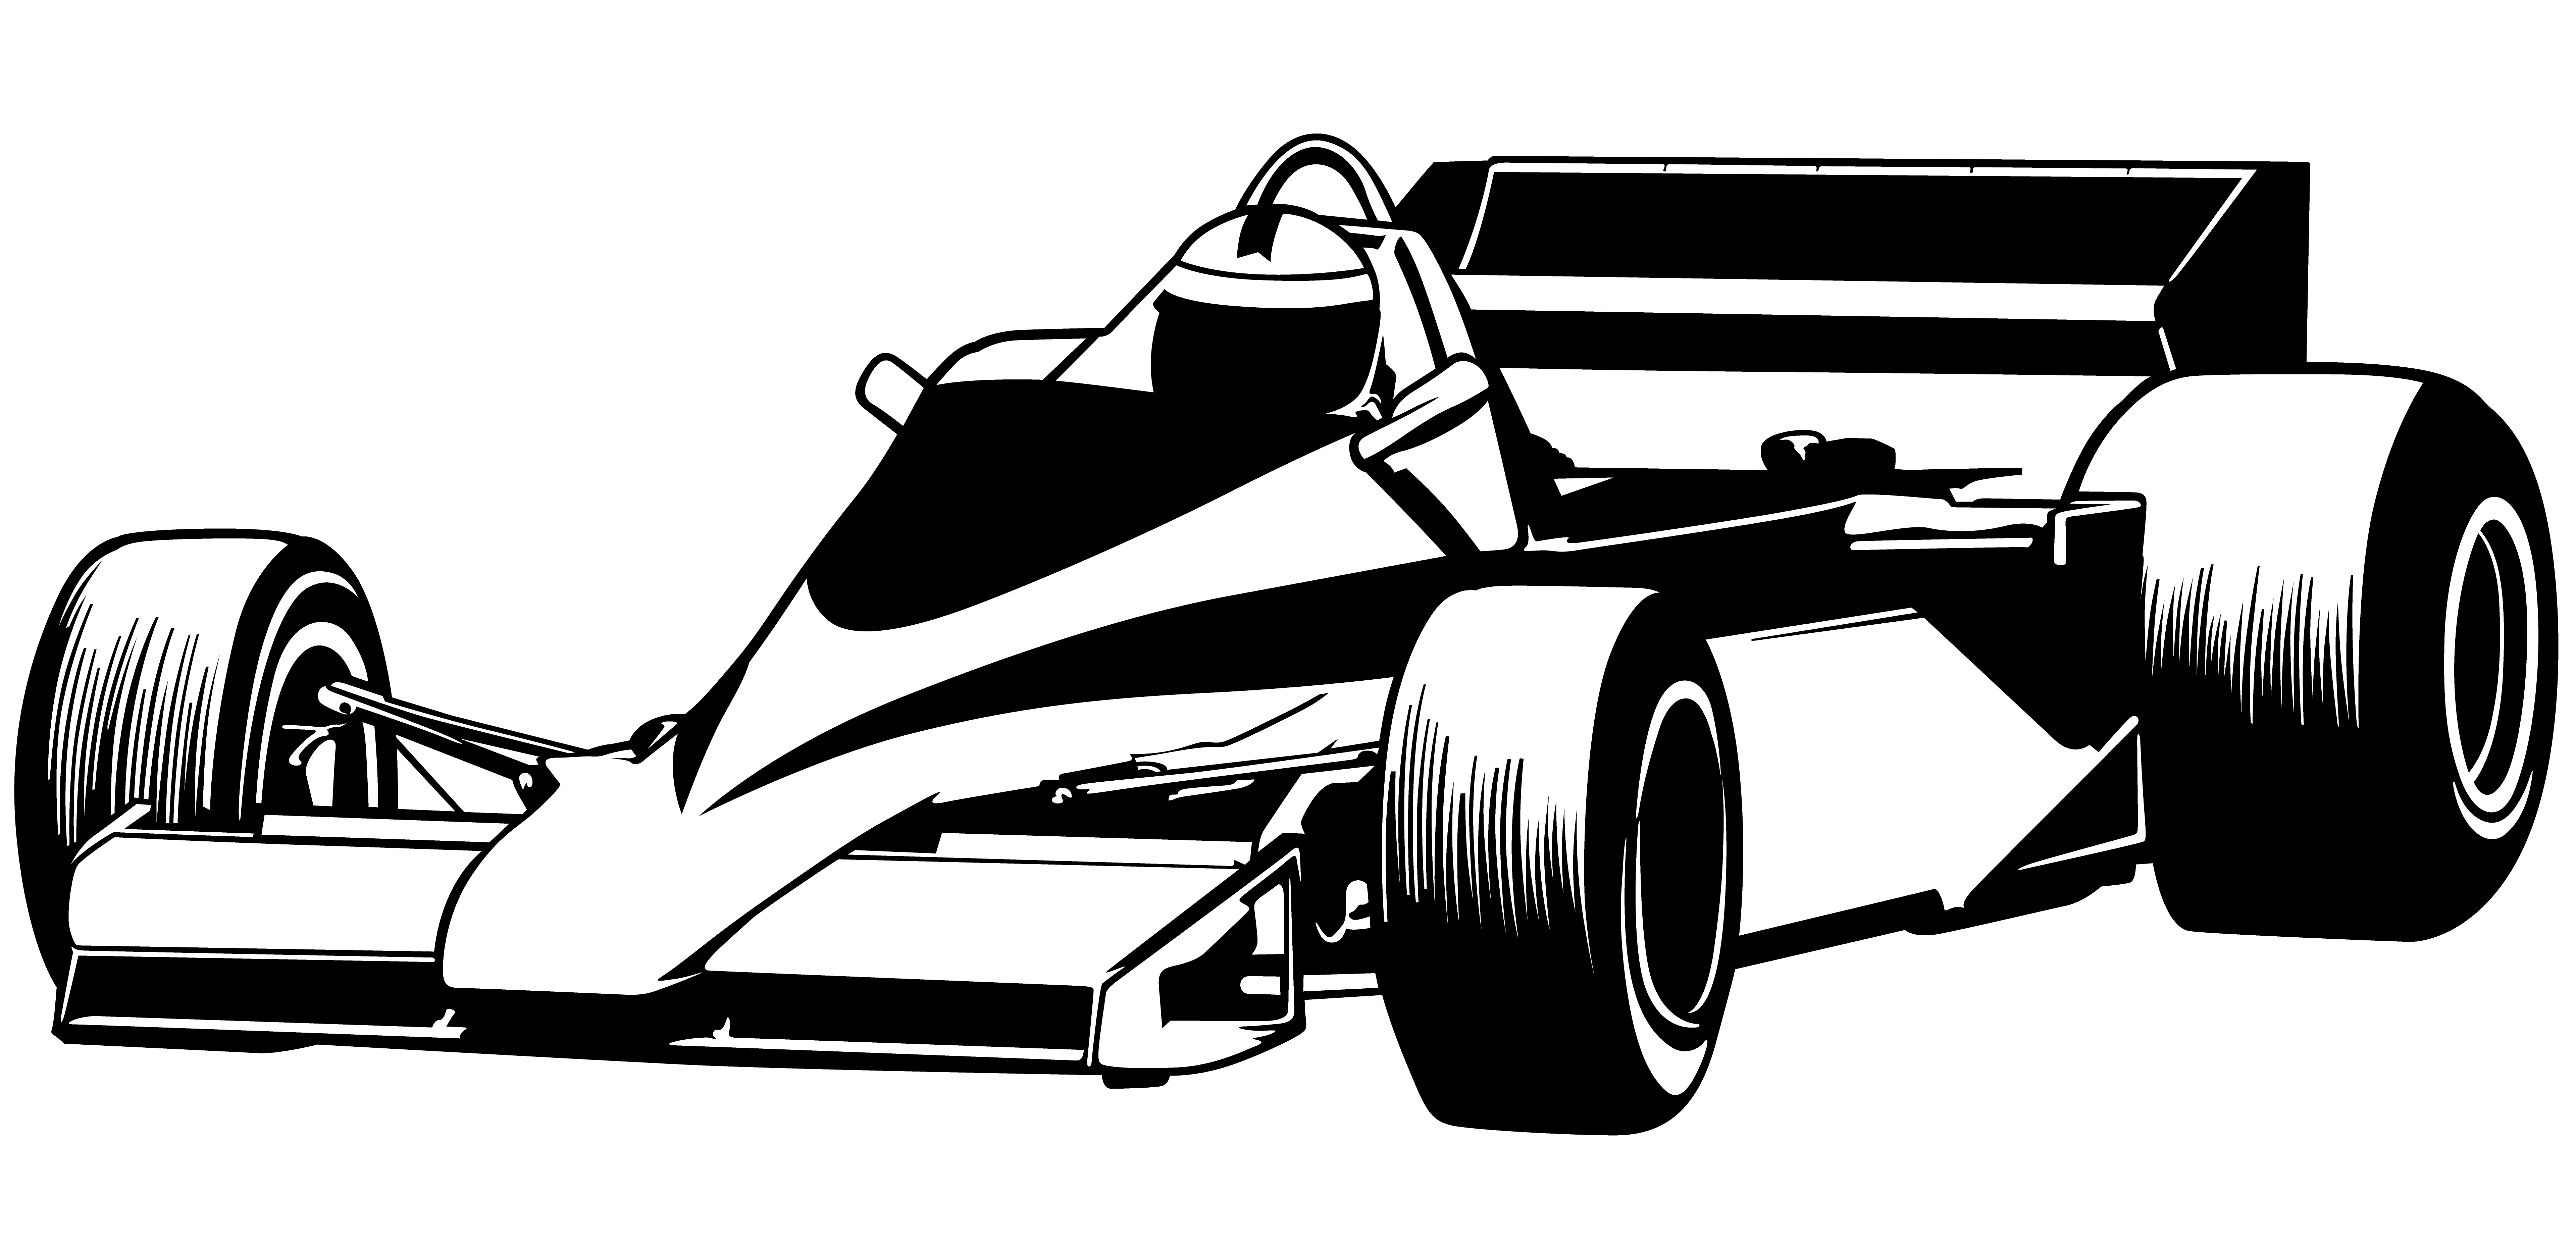 Indy car 6021